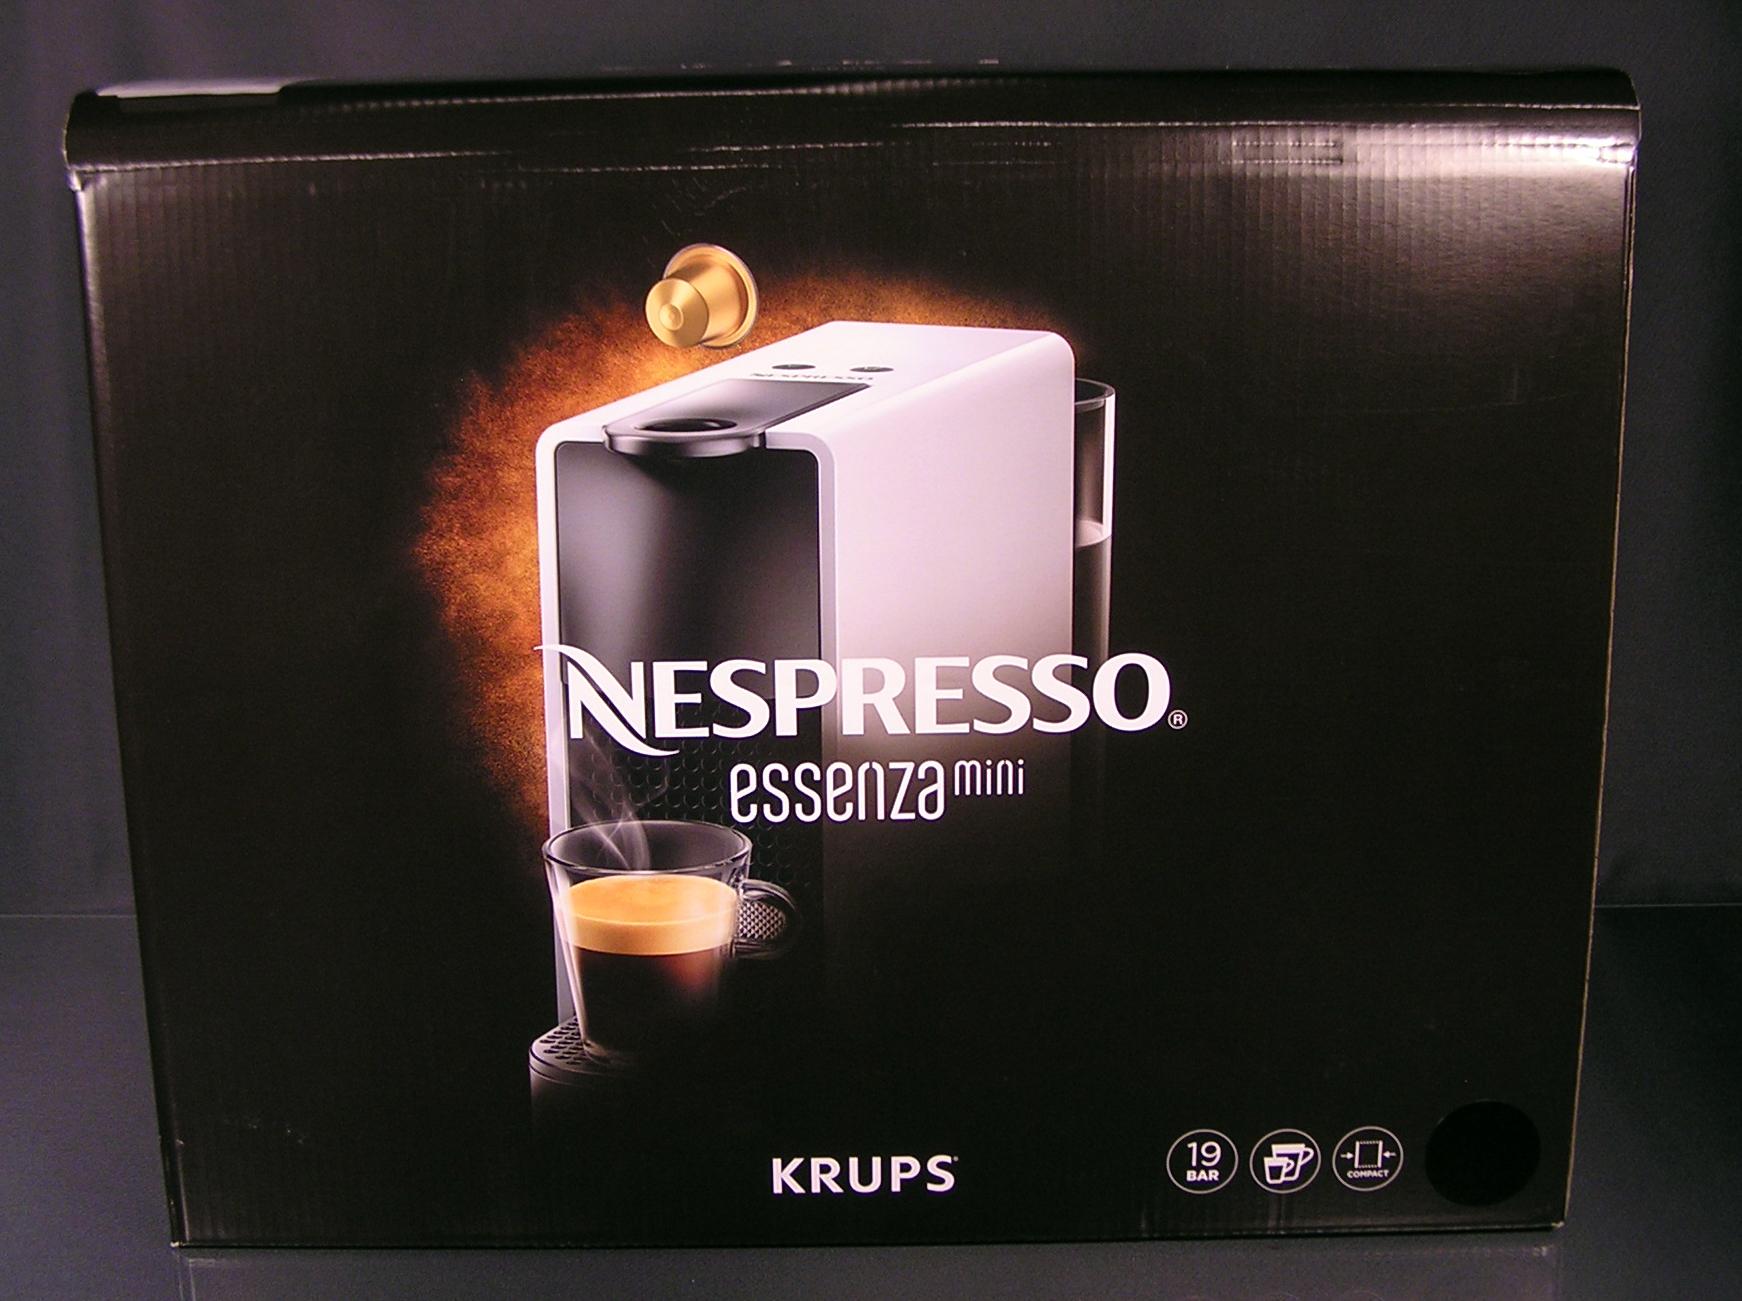 Krups nespresso essenza mini schwarz glänzend kapselmaschine